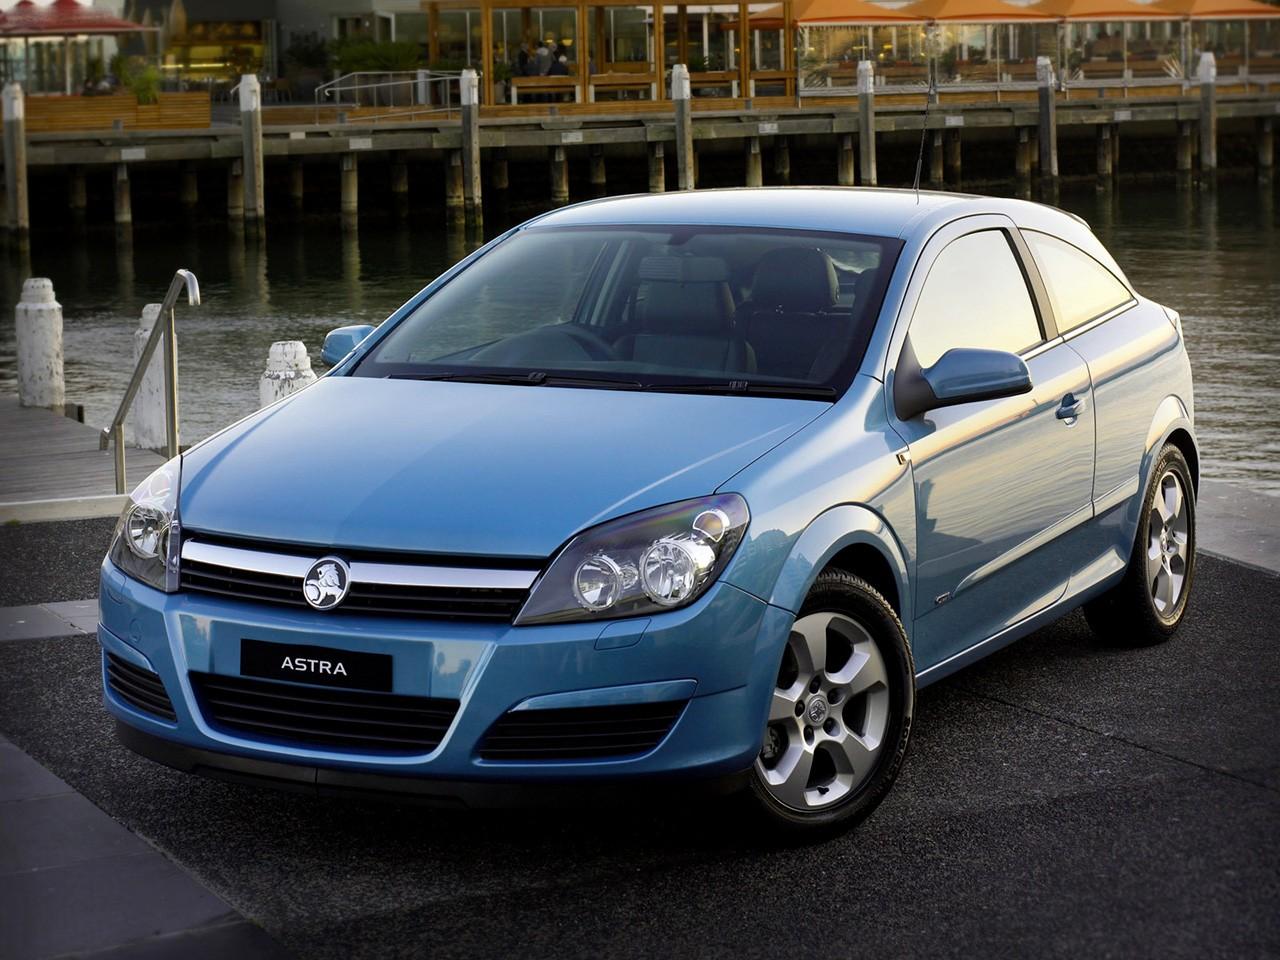 Holden astra 3 doors specs 2004 2005 2006 2007 2008 2009 holden astra 3 doors 2004 2009 vanachro Choice Image